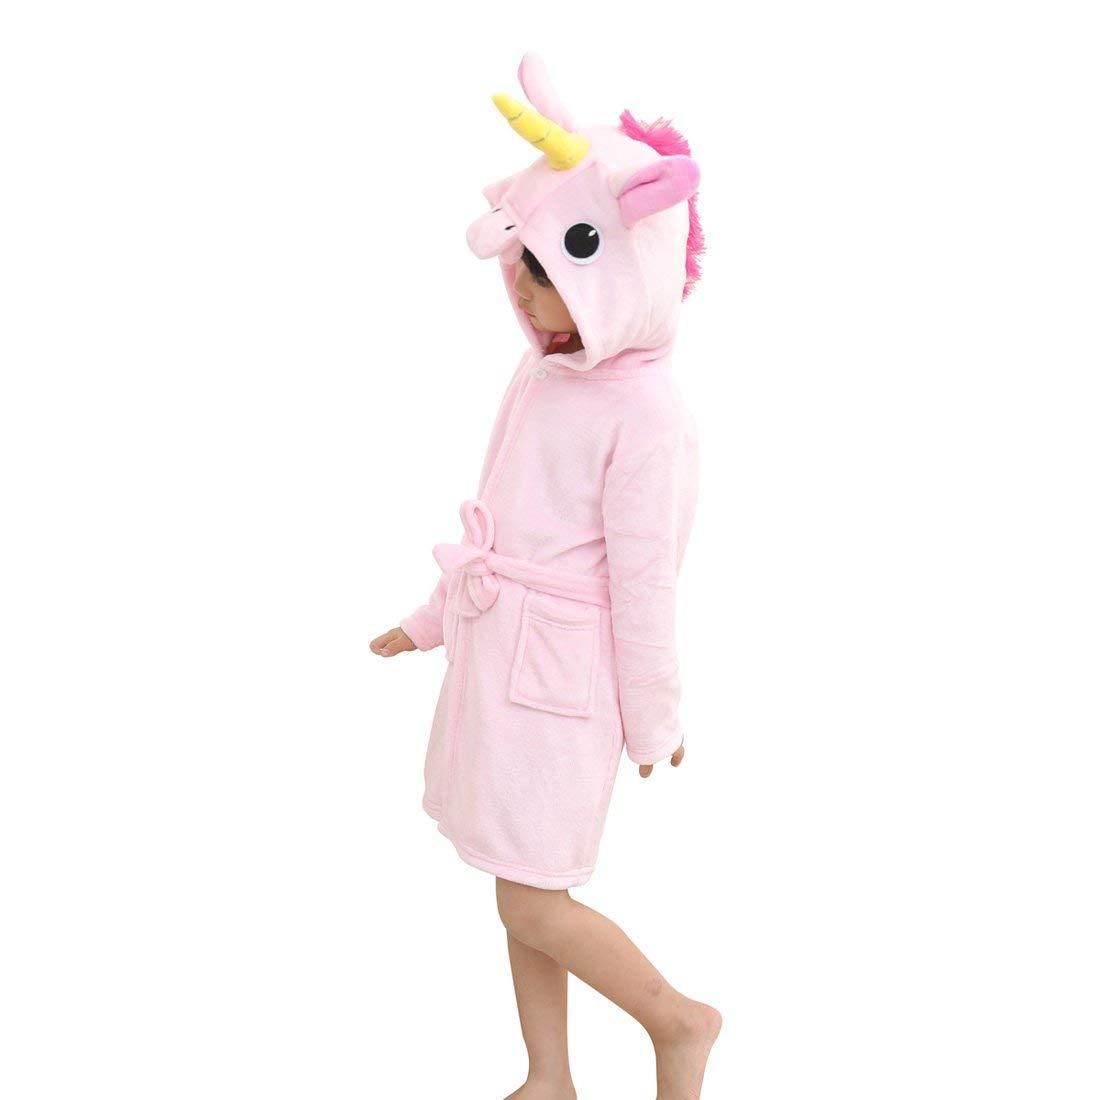 45564ca727 Get Quotations · Toddler Pink Unicorn Bath Robe Girls Boys Fleece Hooded  Bathrobe Kids Pajamas Children s Sleepwear Plush Kimono